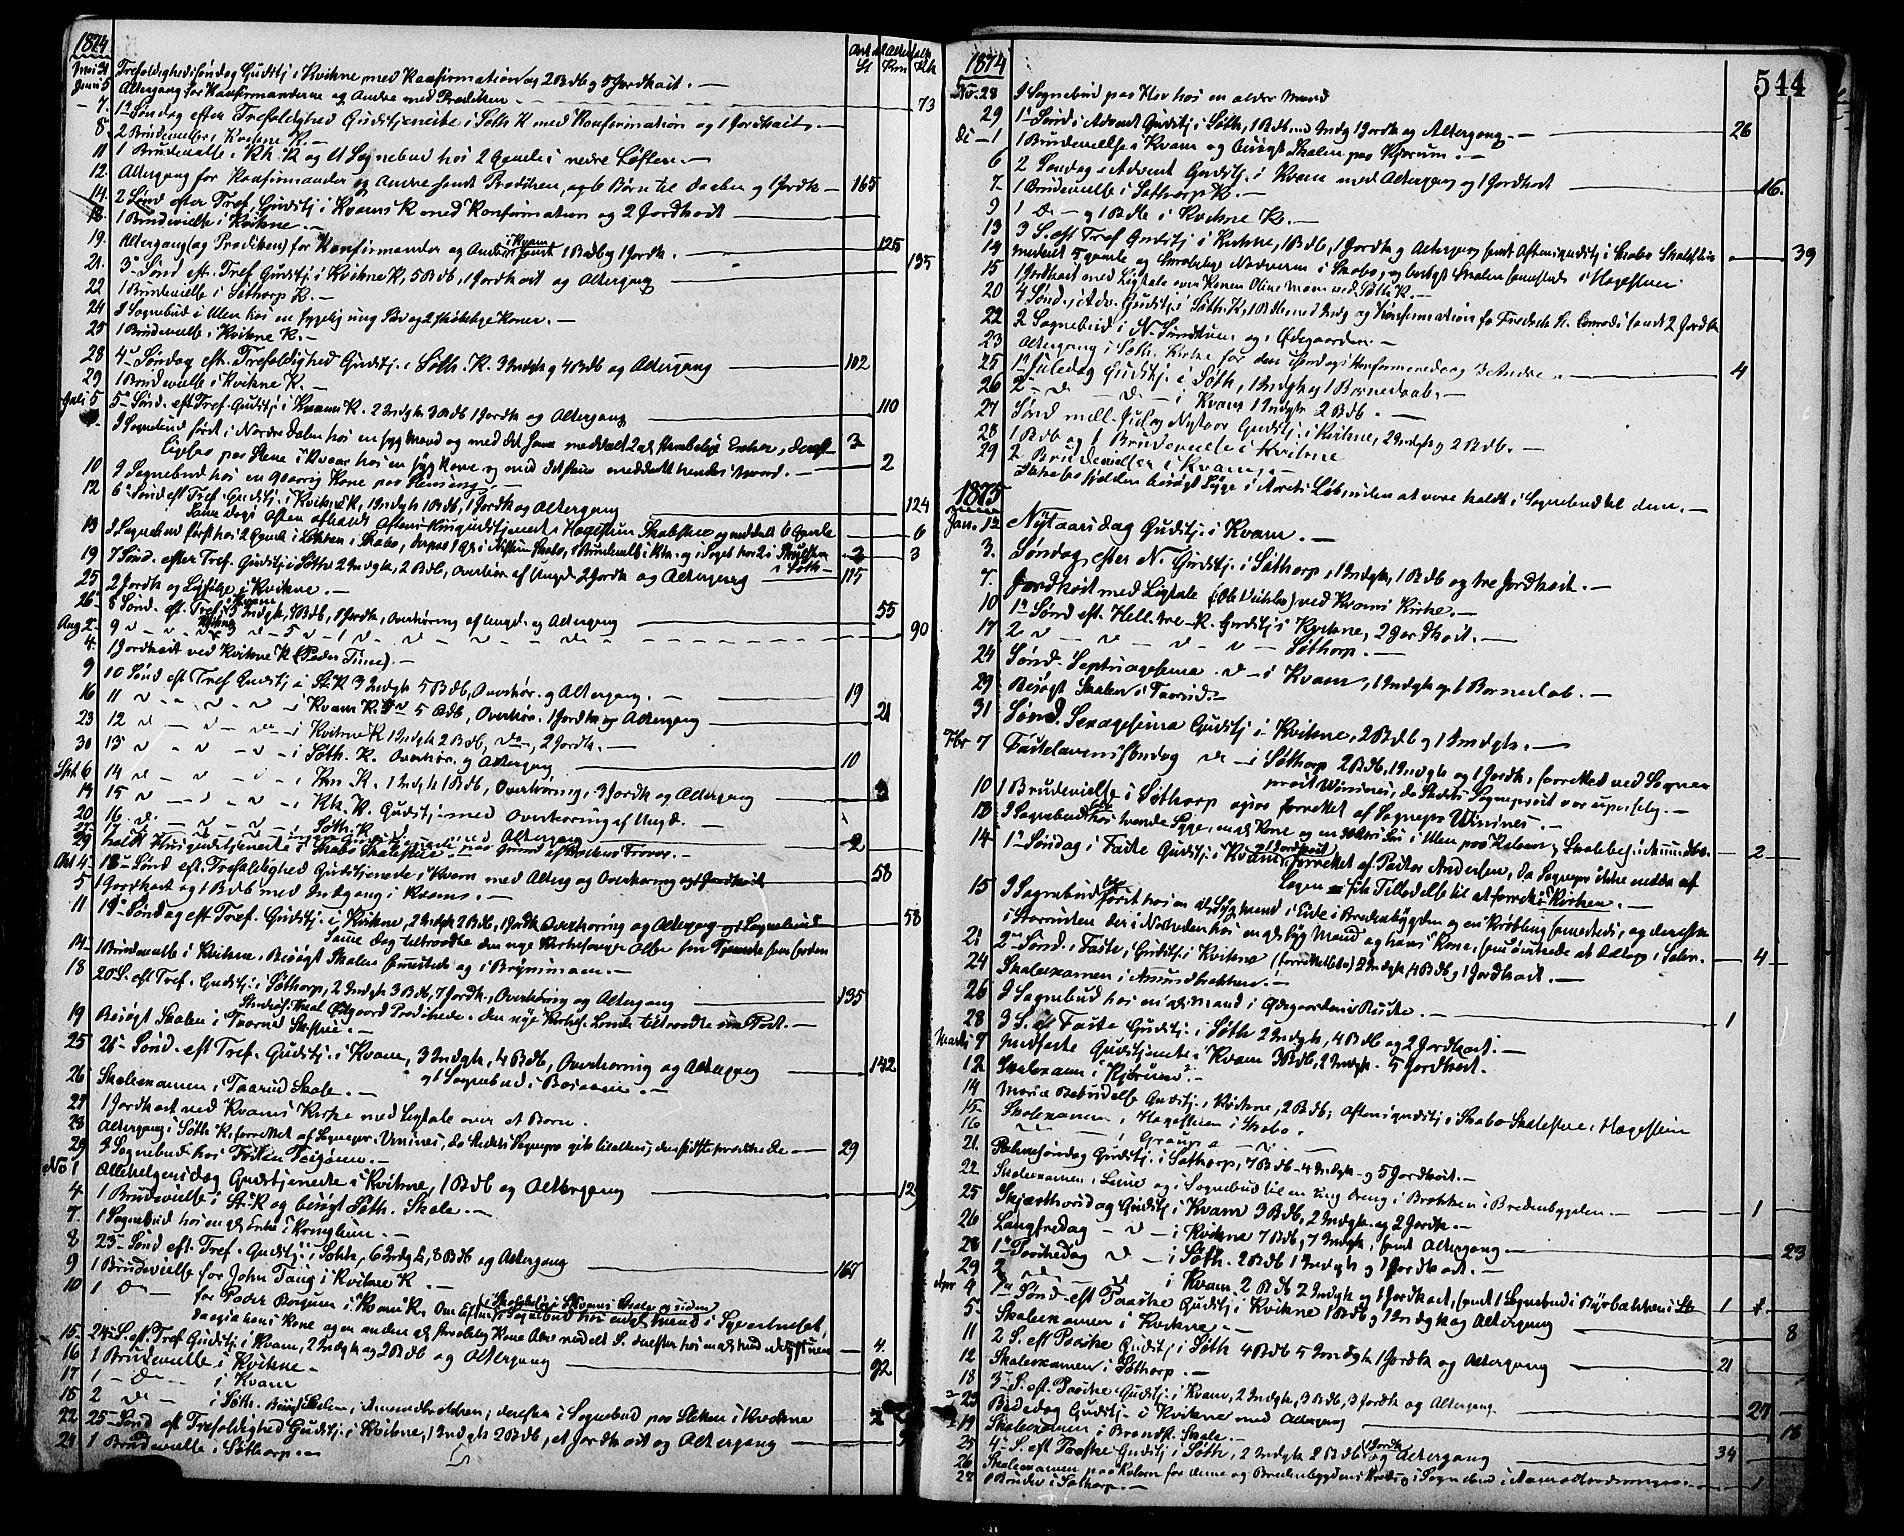 SAH, Nord-Fron prestekontor, Ministerialbok nr. 2, 1865-1883, s. 544